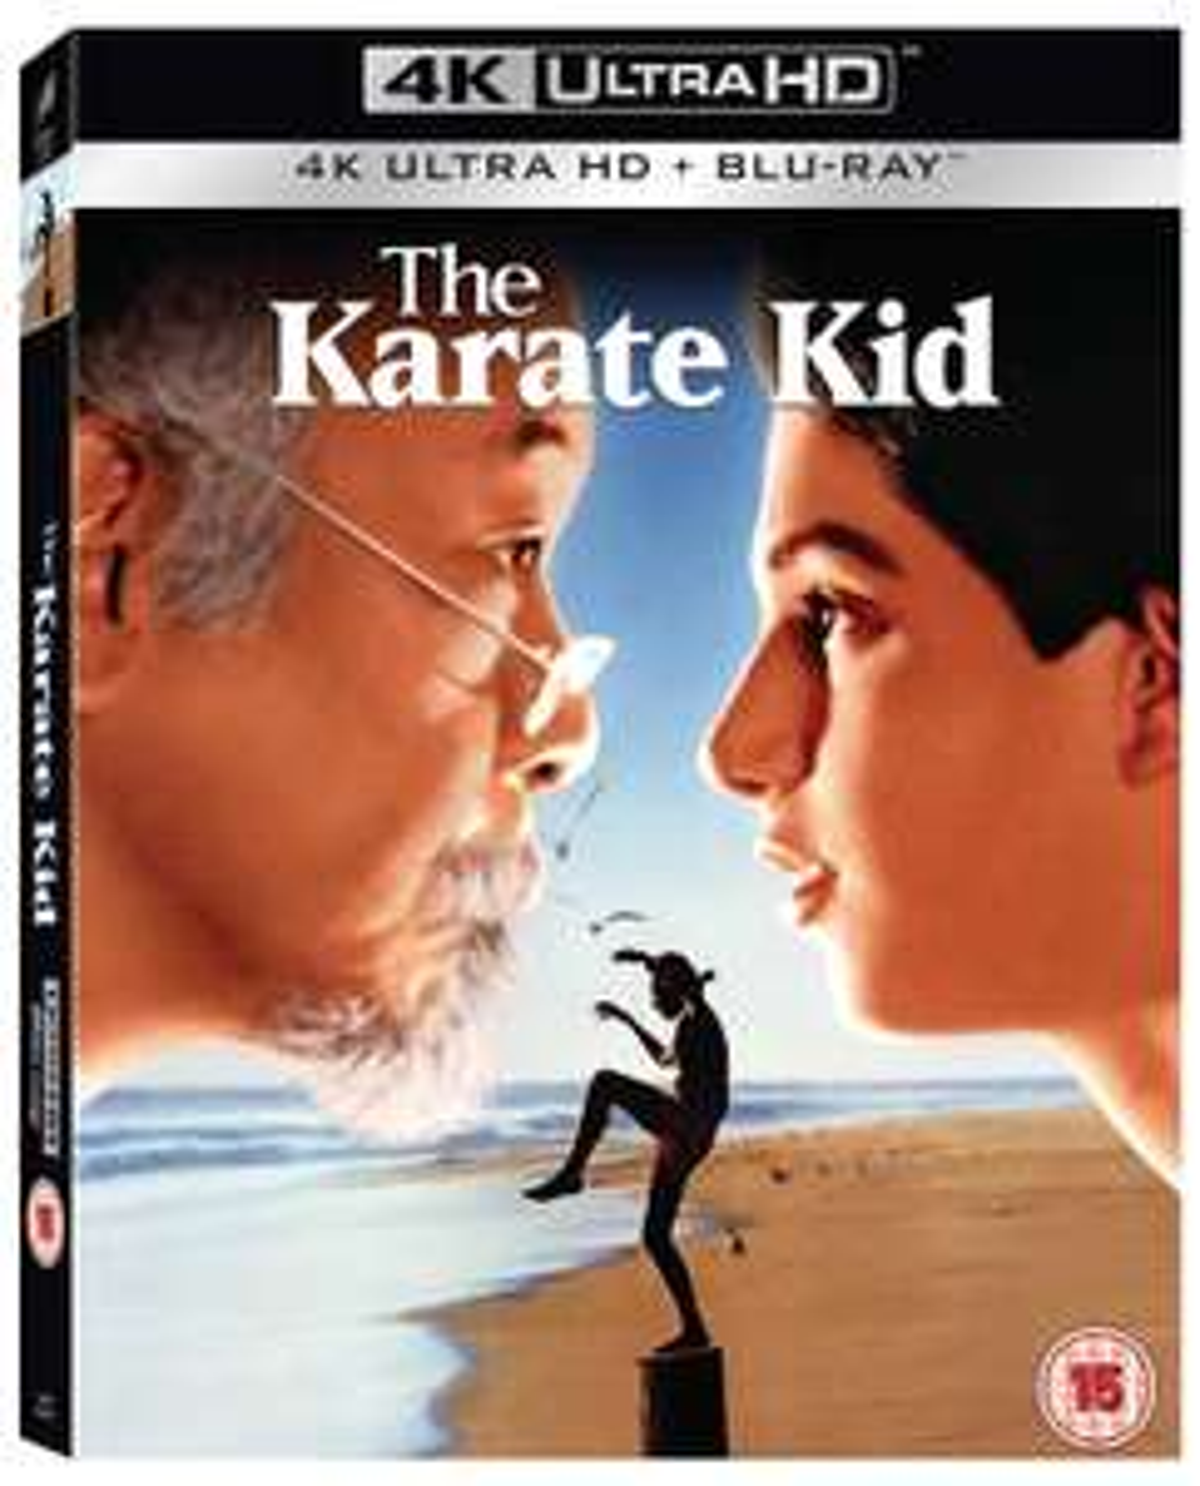 Karate Kid - 35th Anniversary Edition (4K Blu-ray + Blu-ray) für 13,77€ inkl. Versand (Zoom UK)